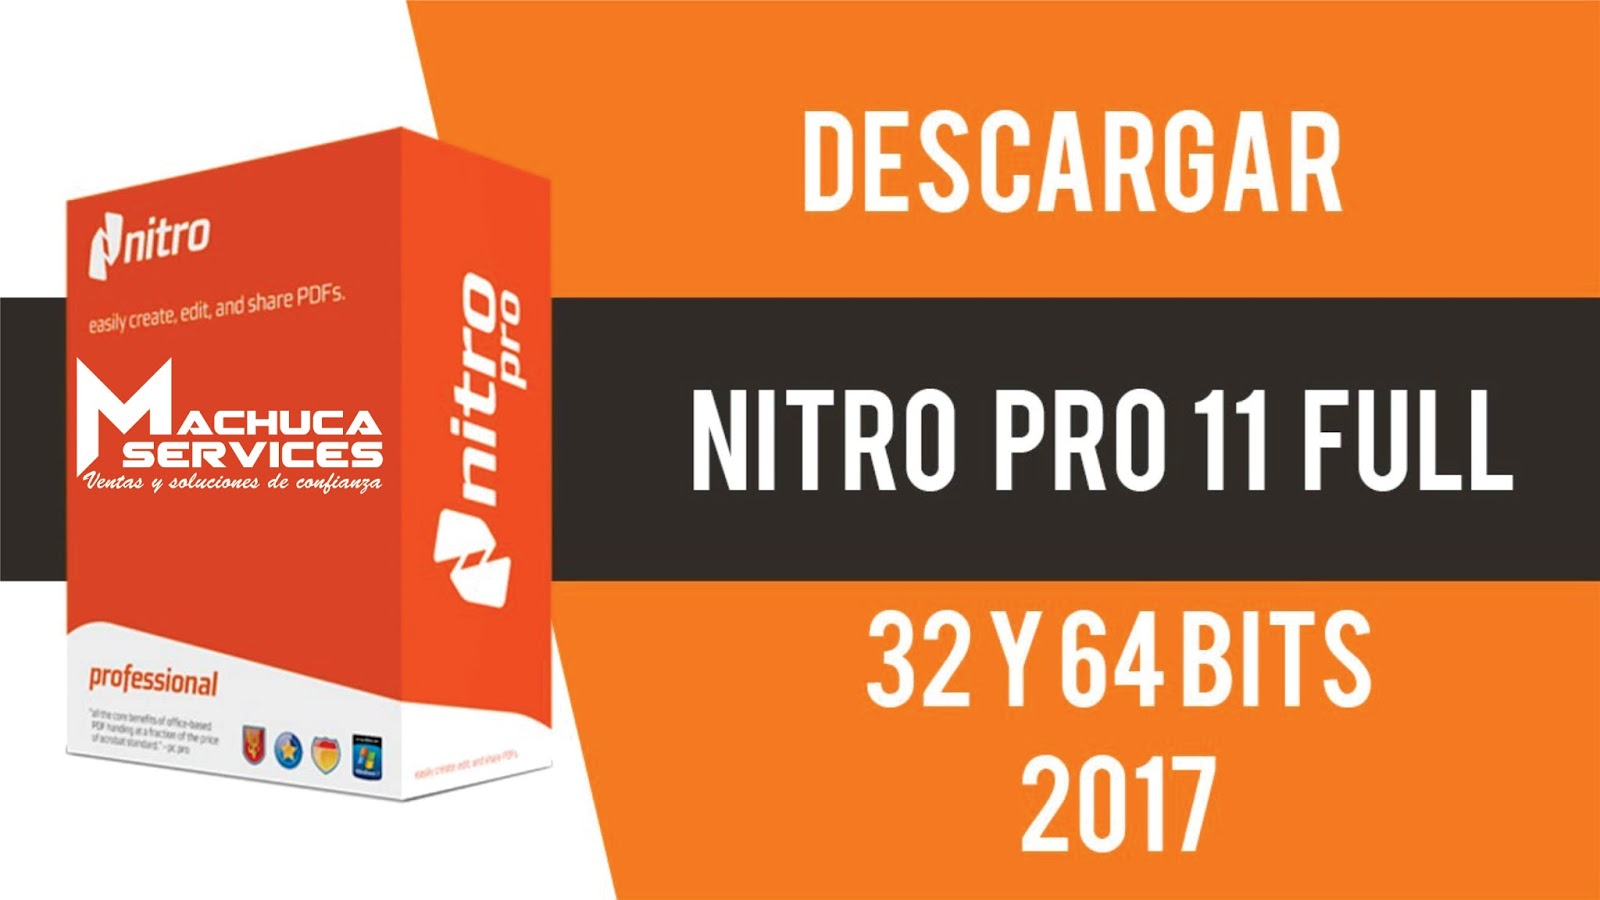 nitro pdf full descargar